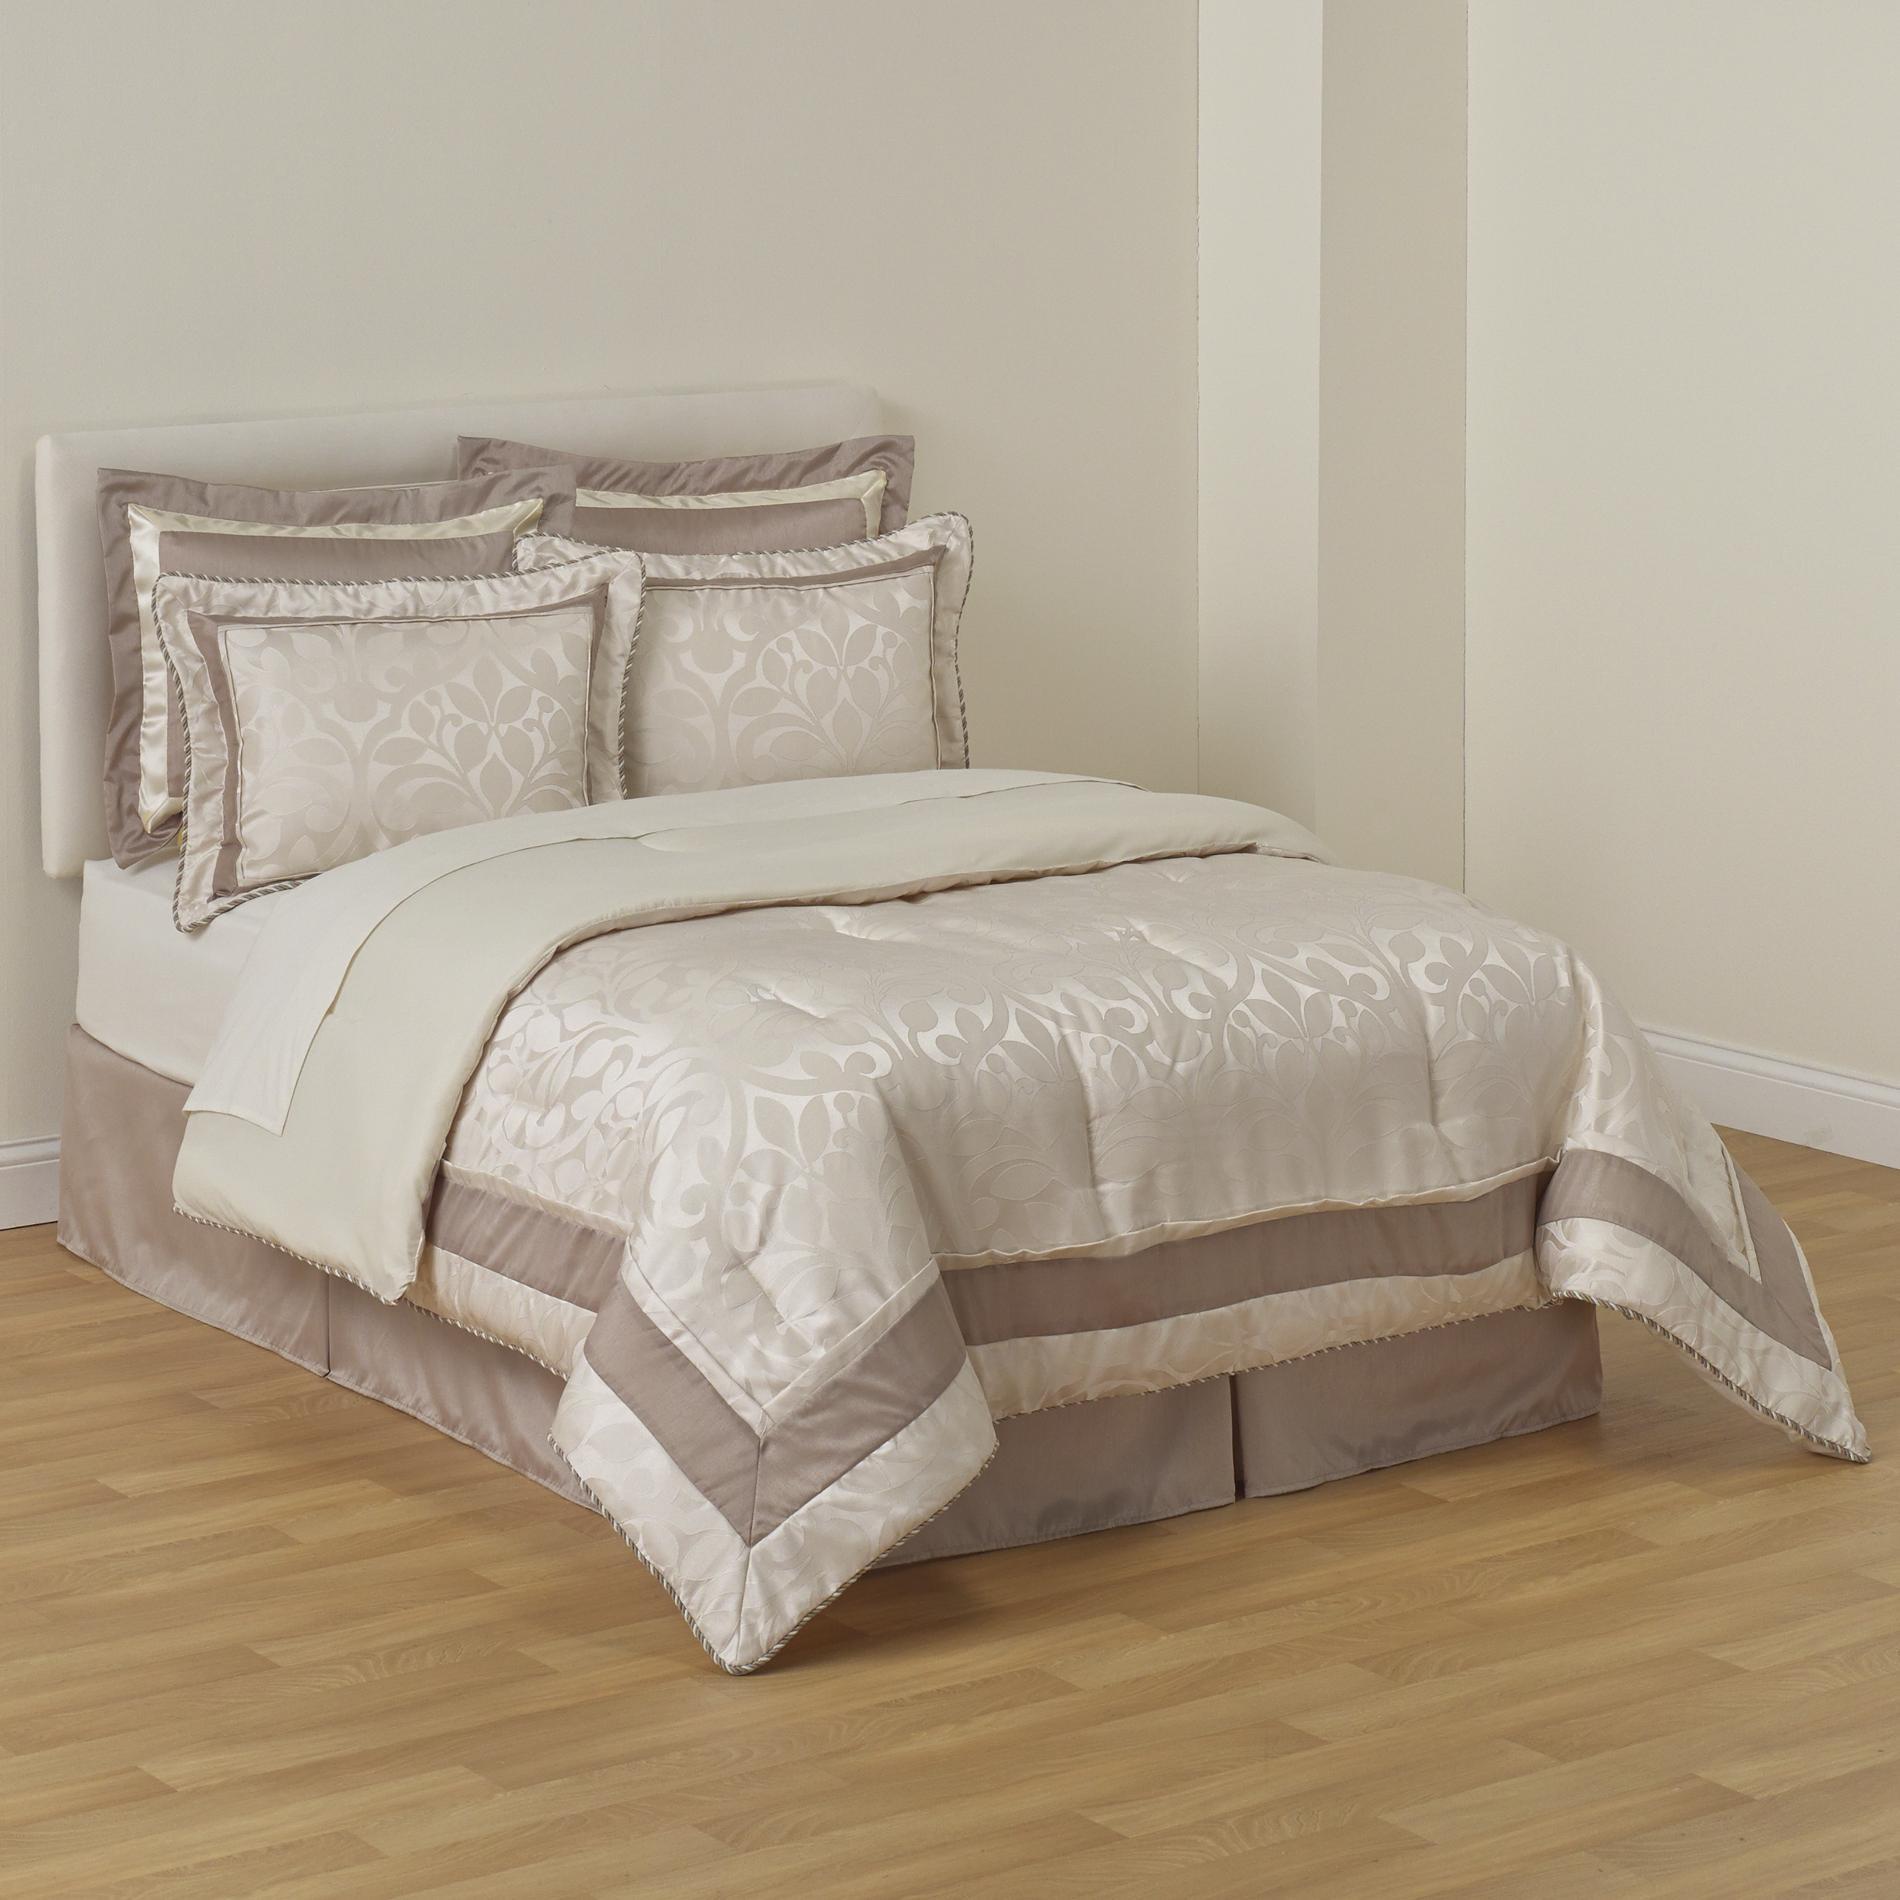 Jaclyn Smith 6-Piece Comforter Set - Botanical Jacquard